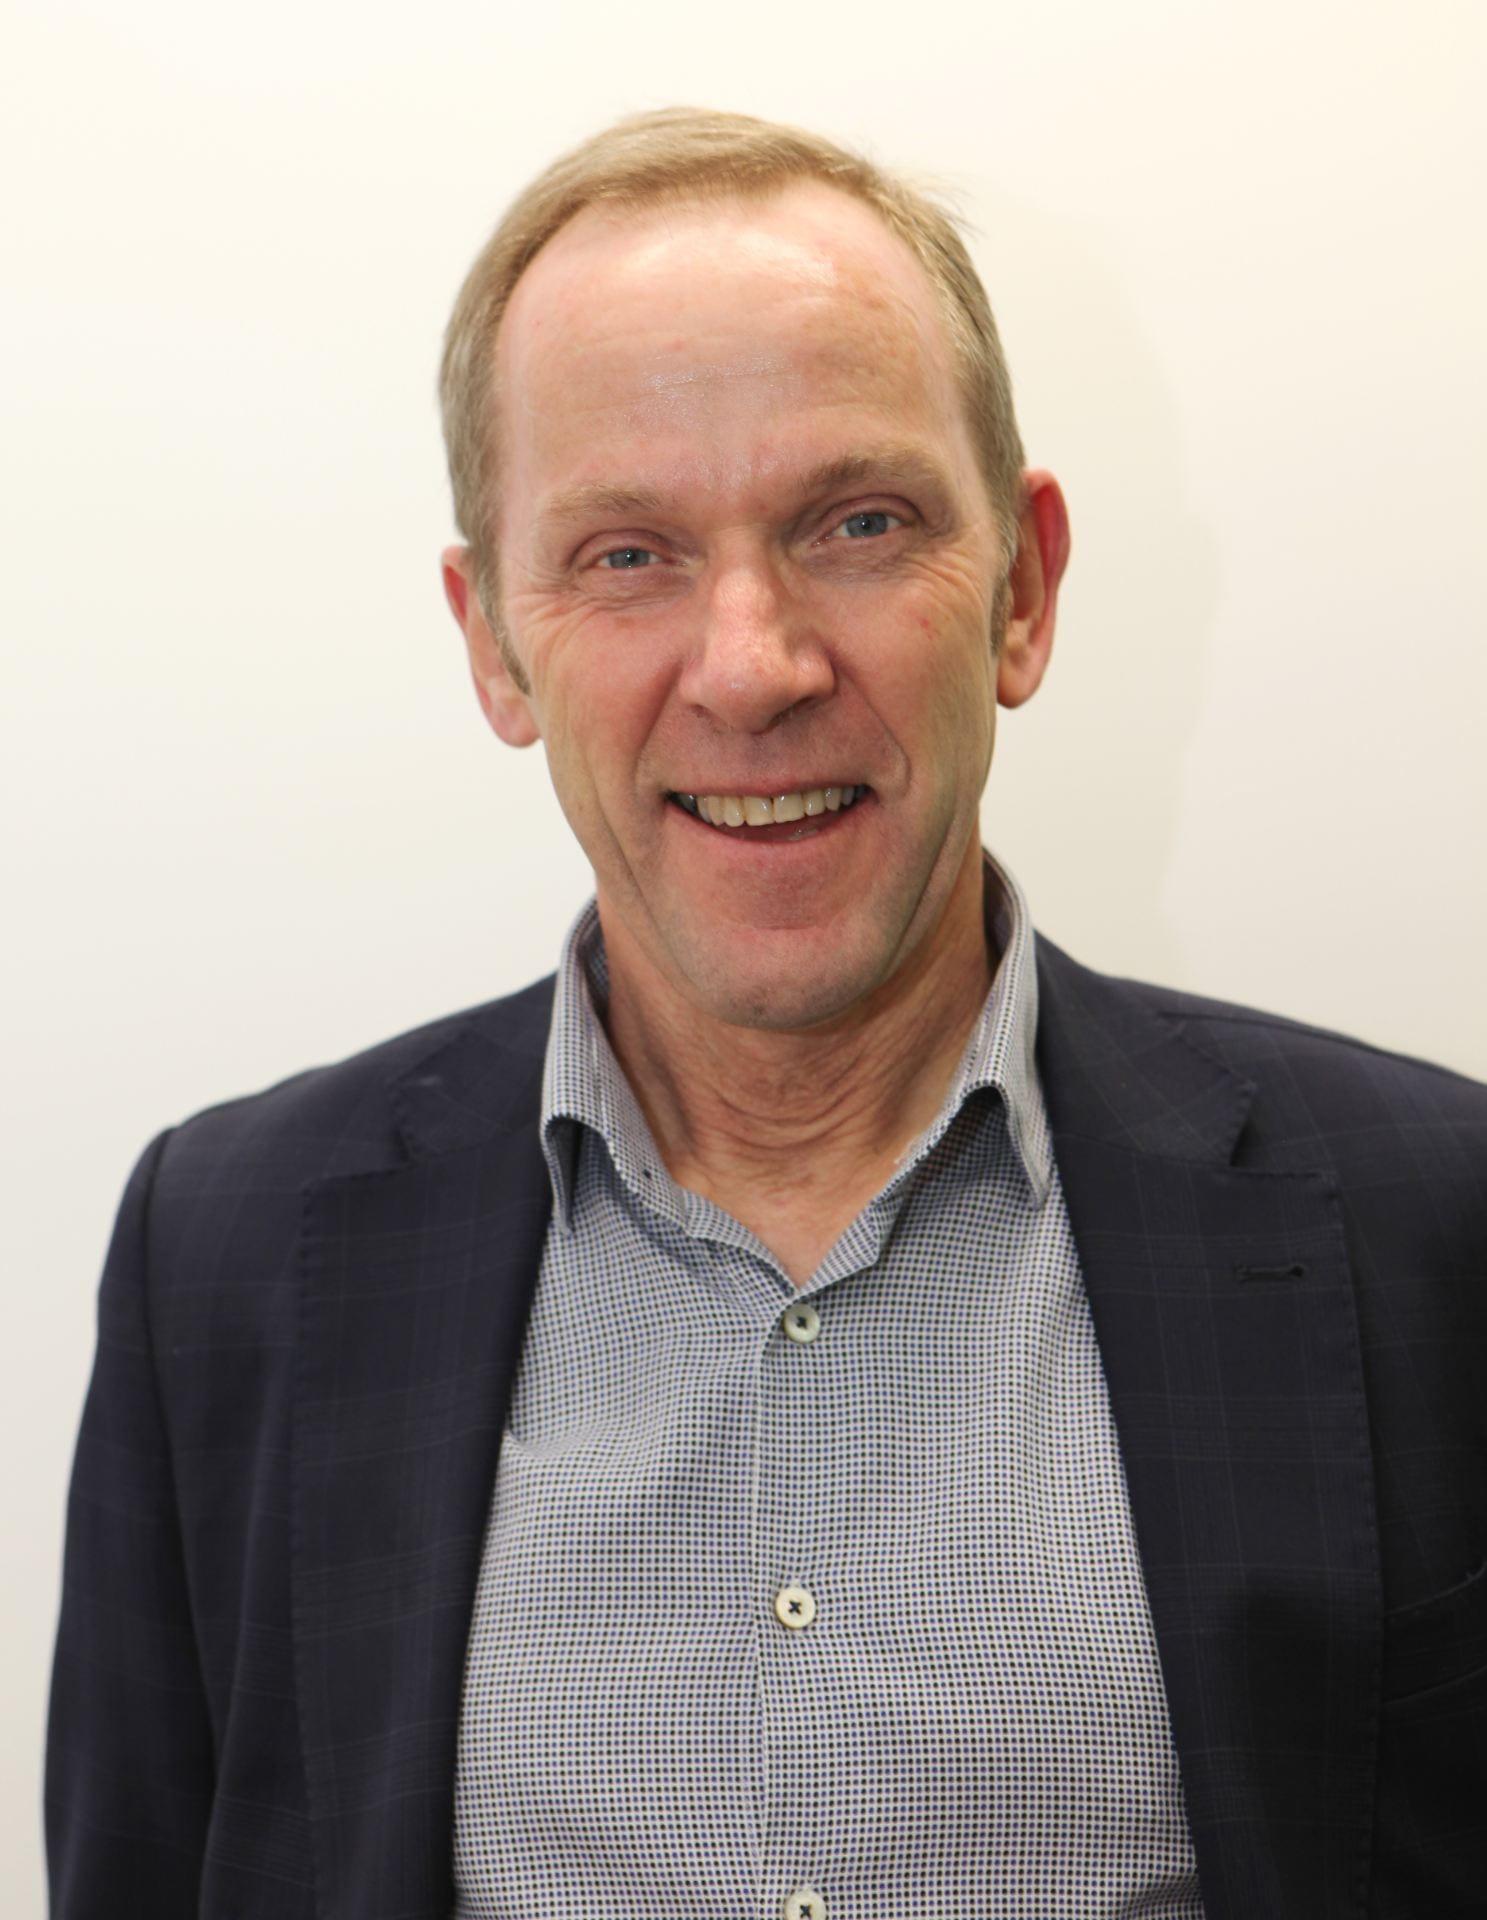 Peter Browett